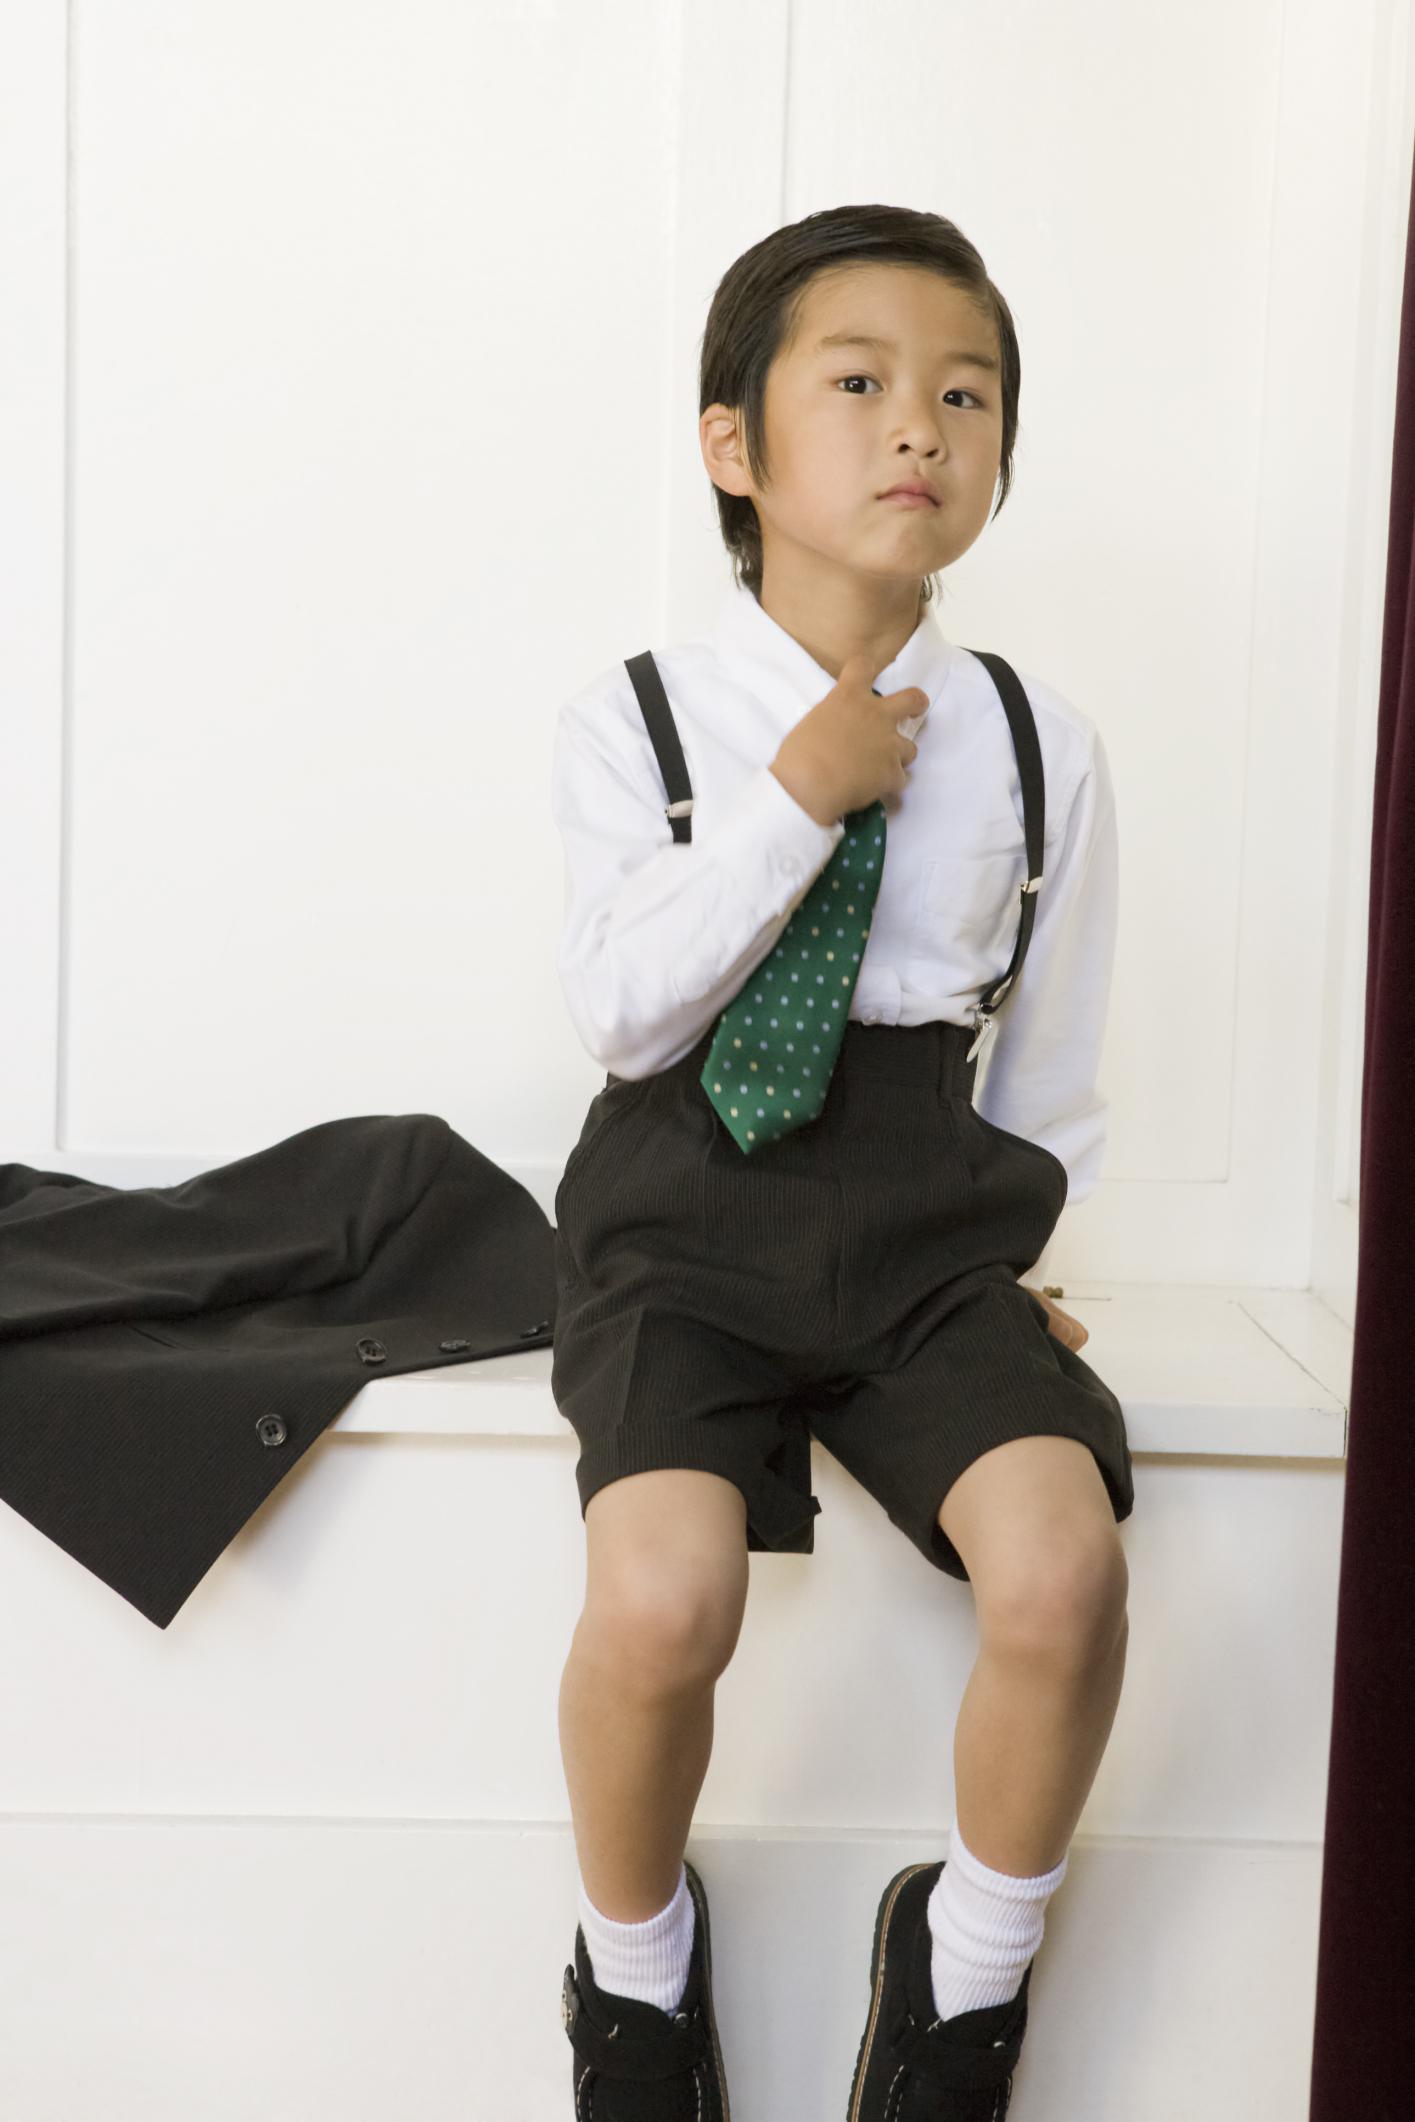 Persuasive Essay Against School Uniforms Introduction